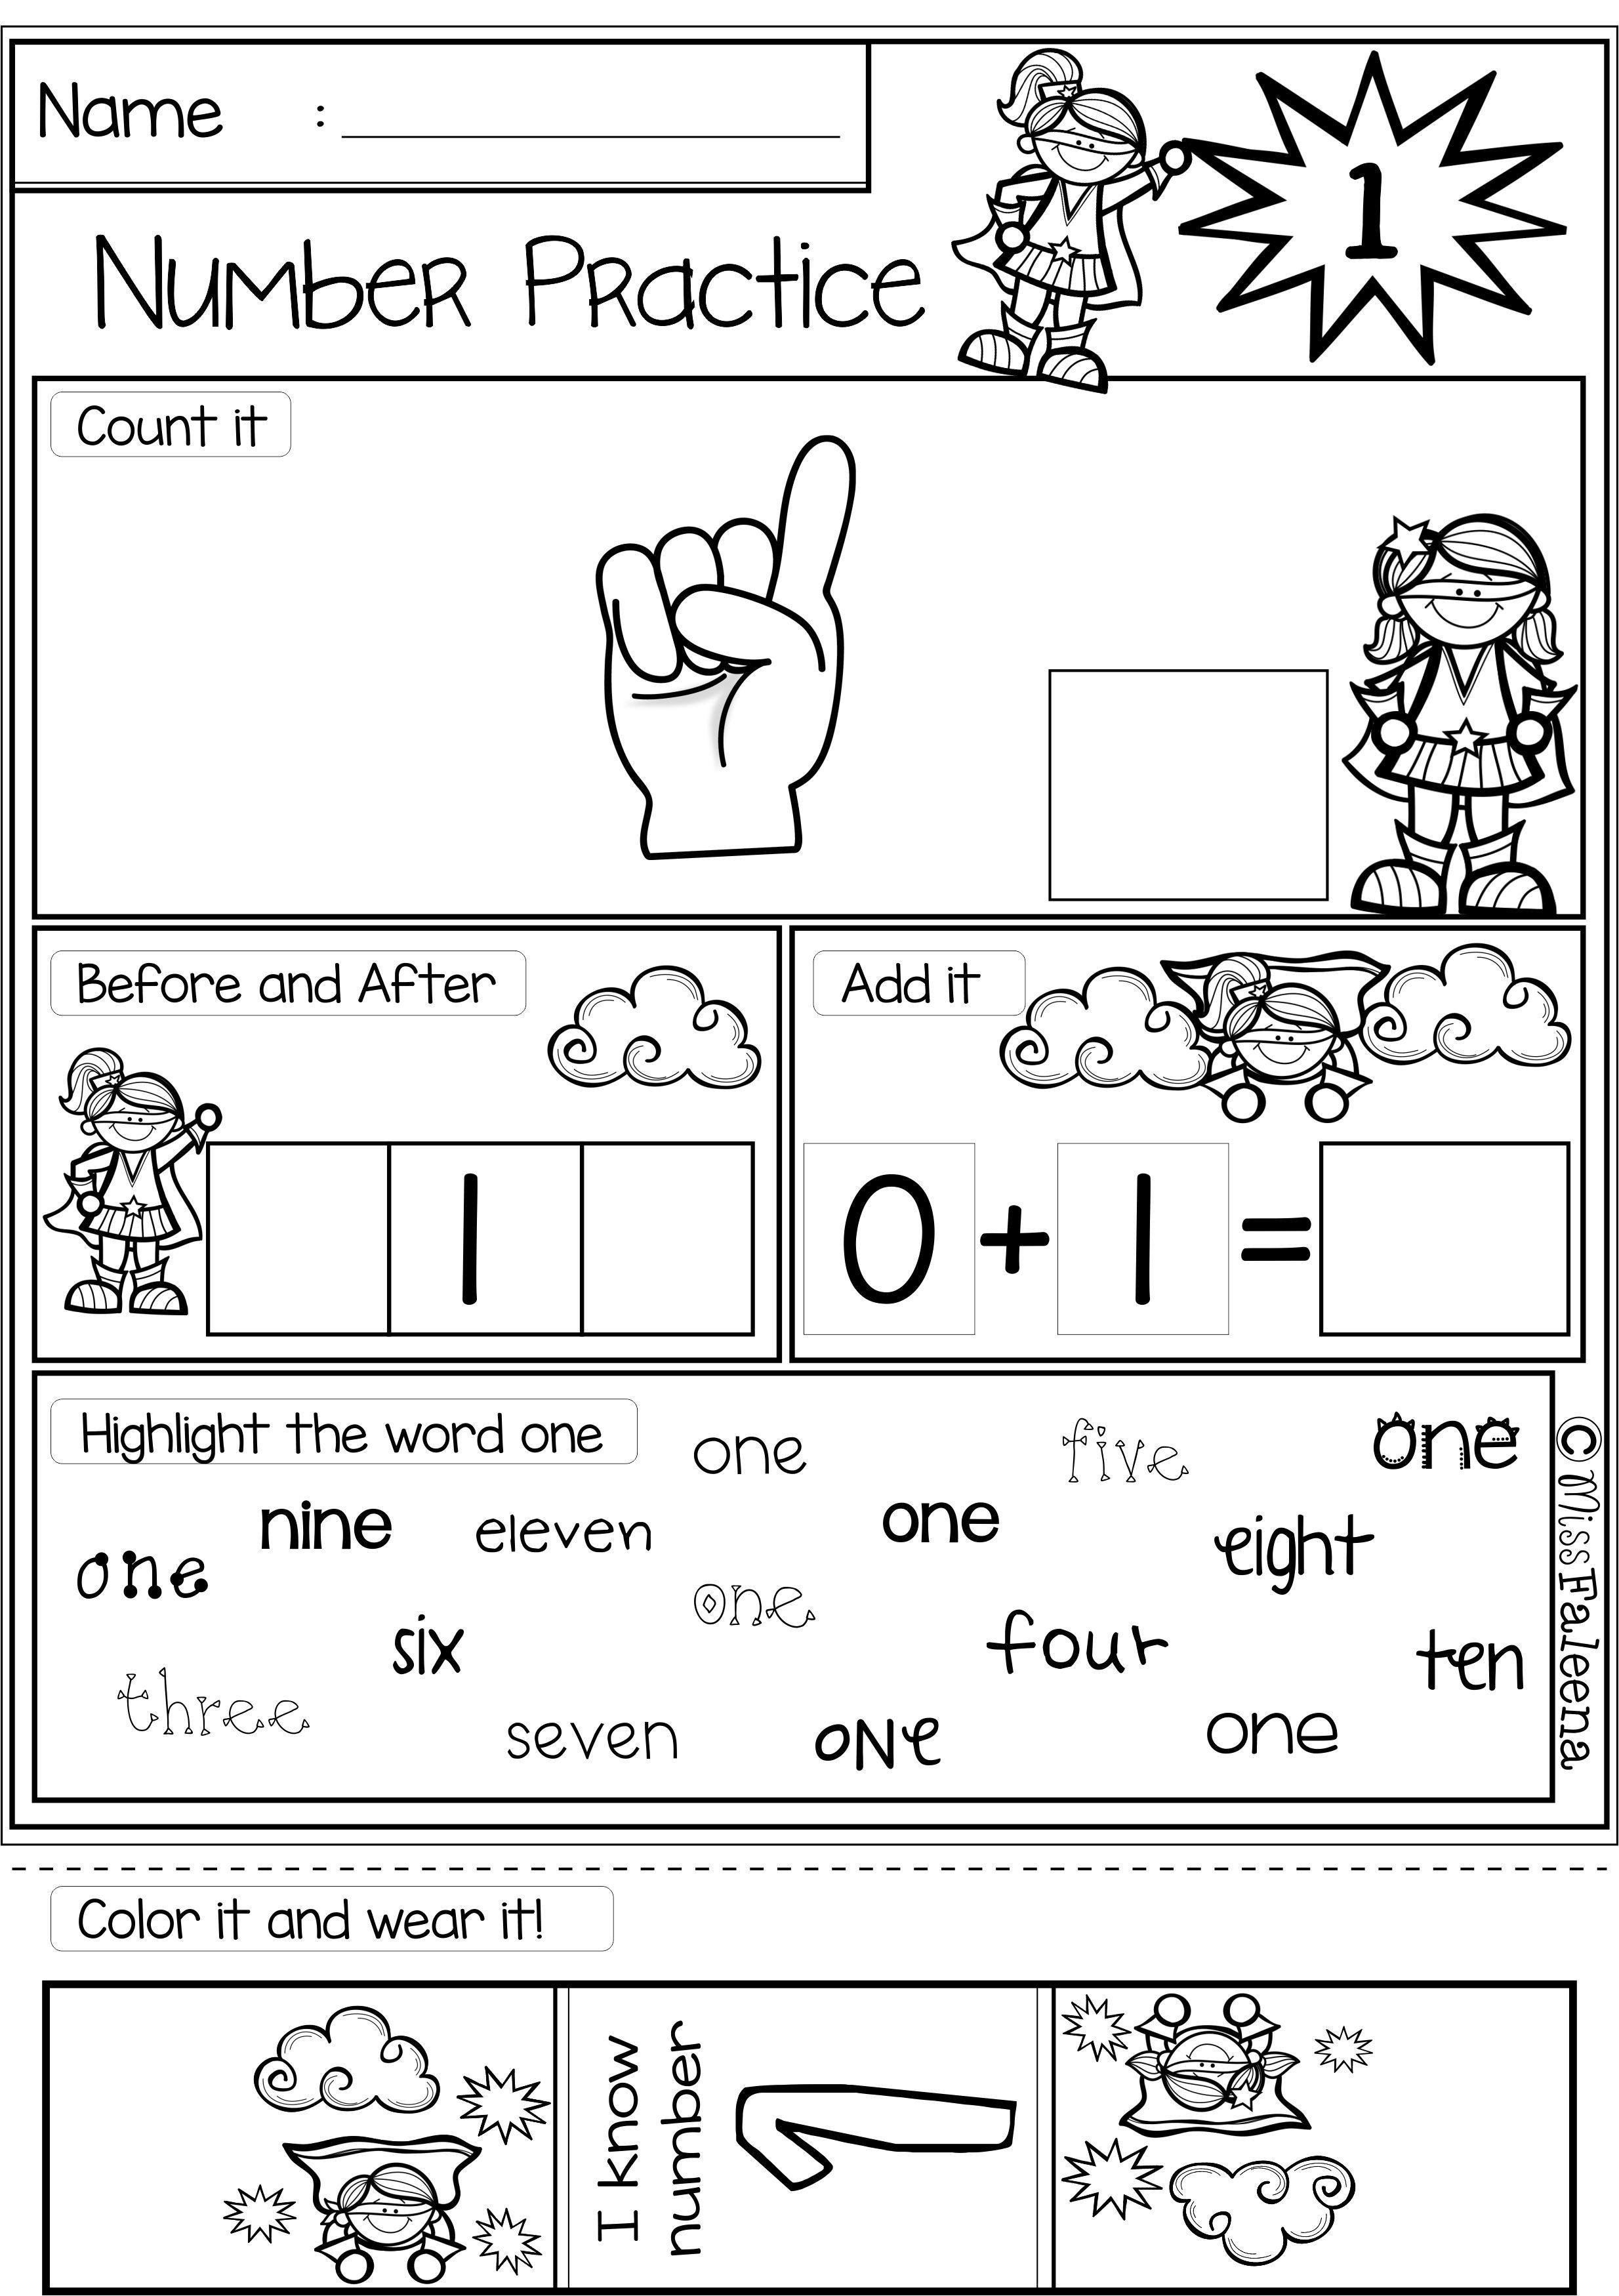 Number 120 Practice Set 2 Kindergarten math Math